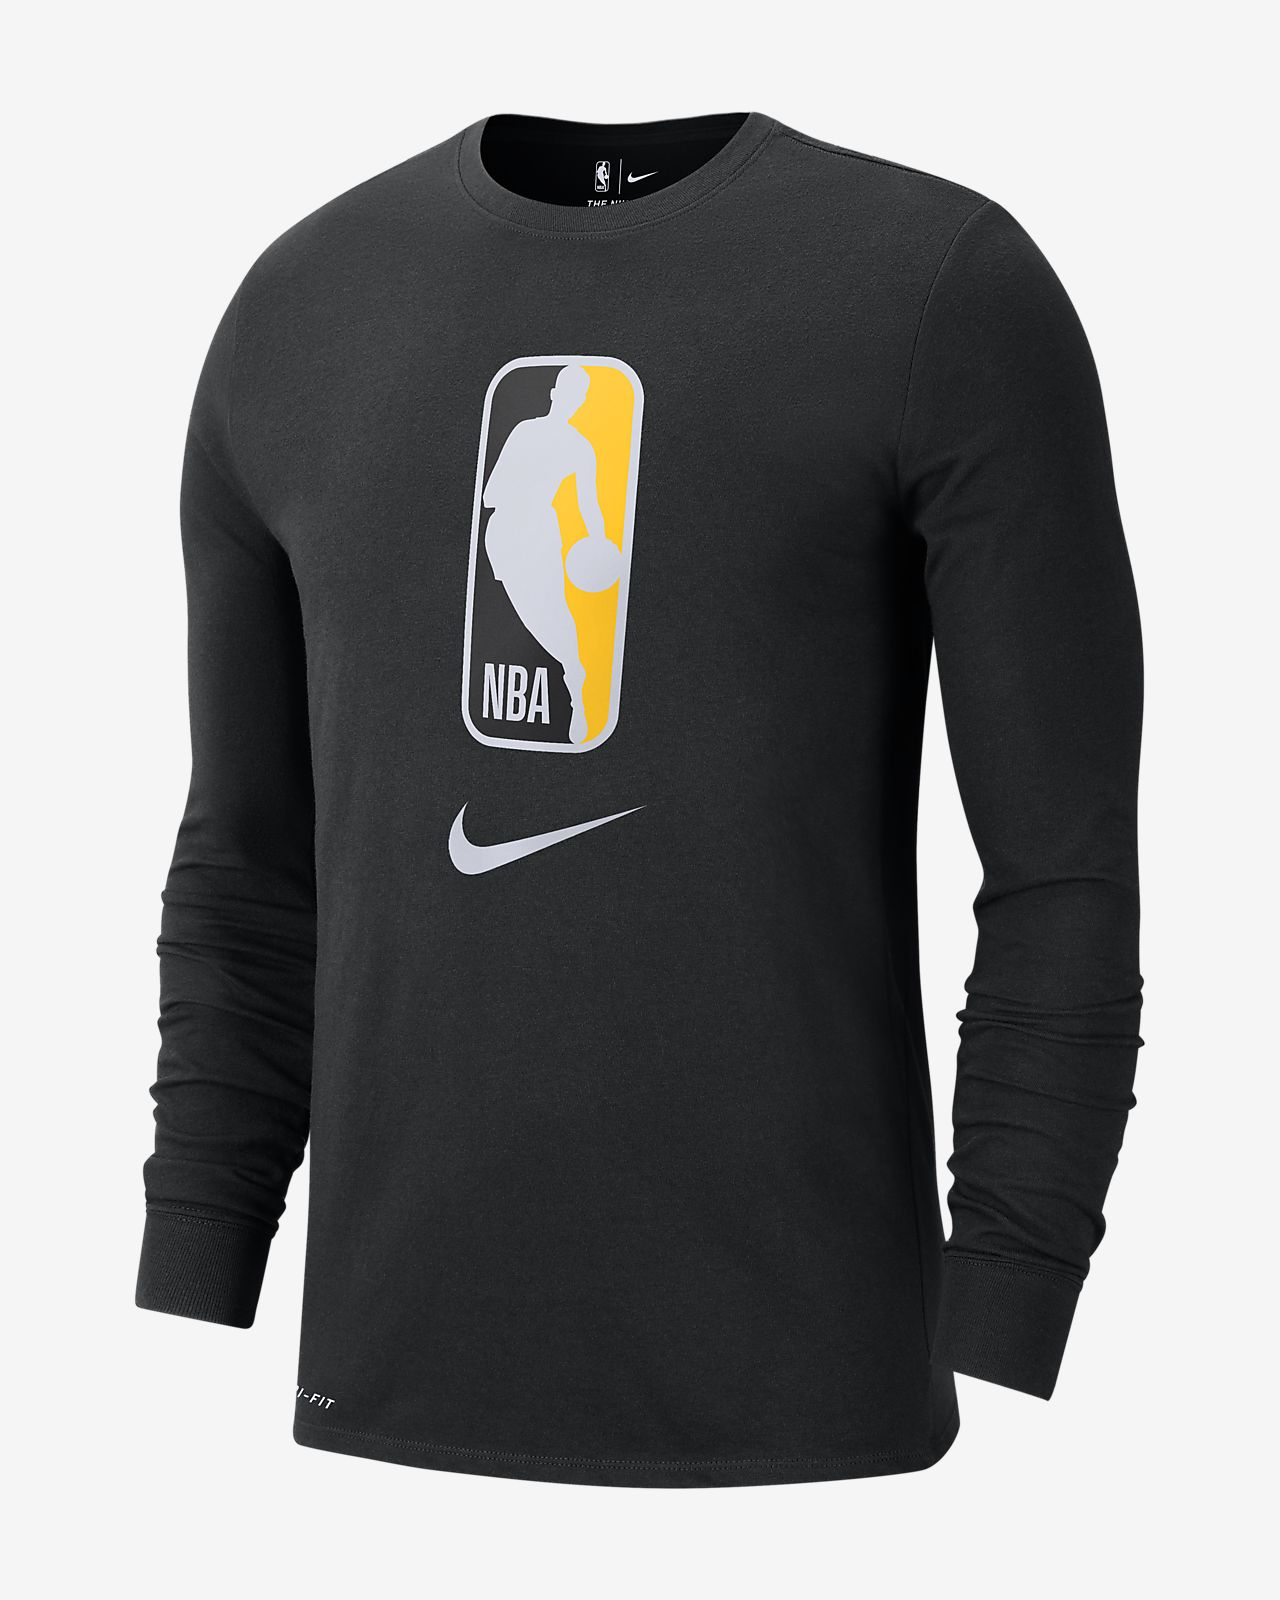 Nike Dri-FIT Camiseta de la NBA de manga larga - Hombre